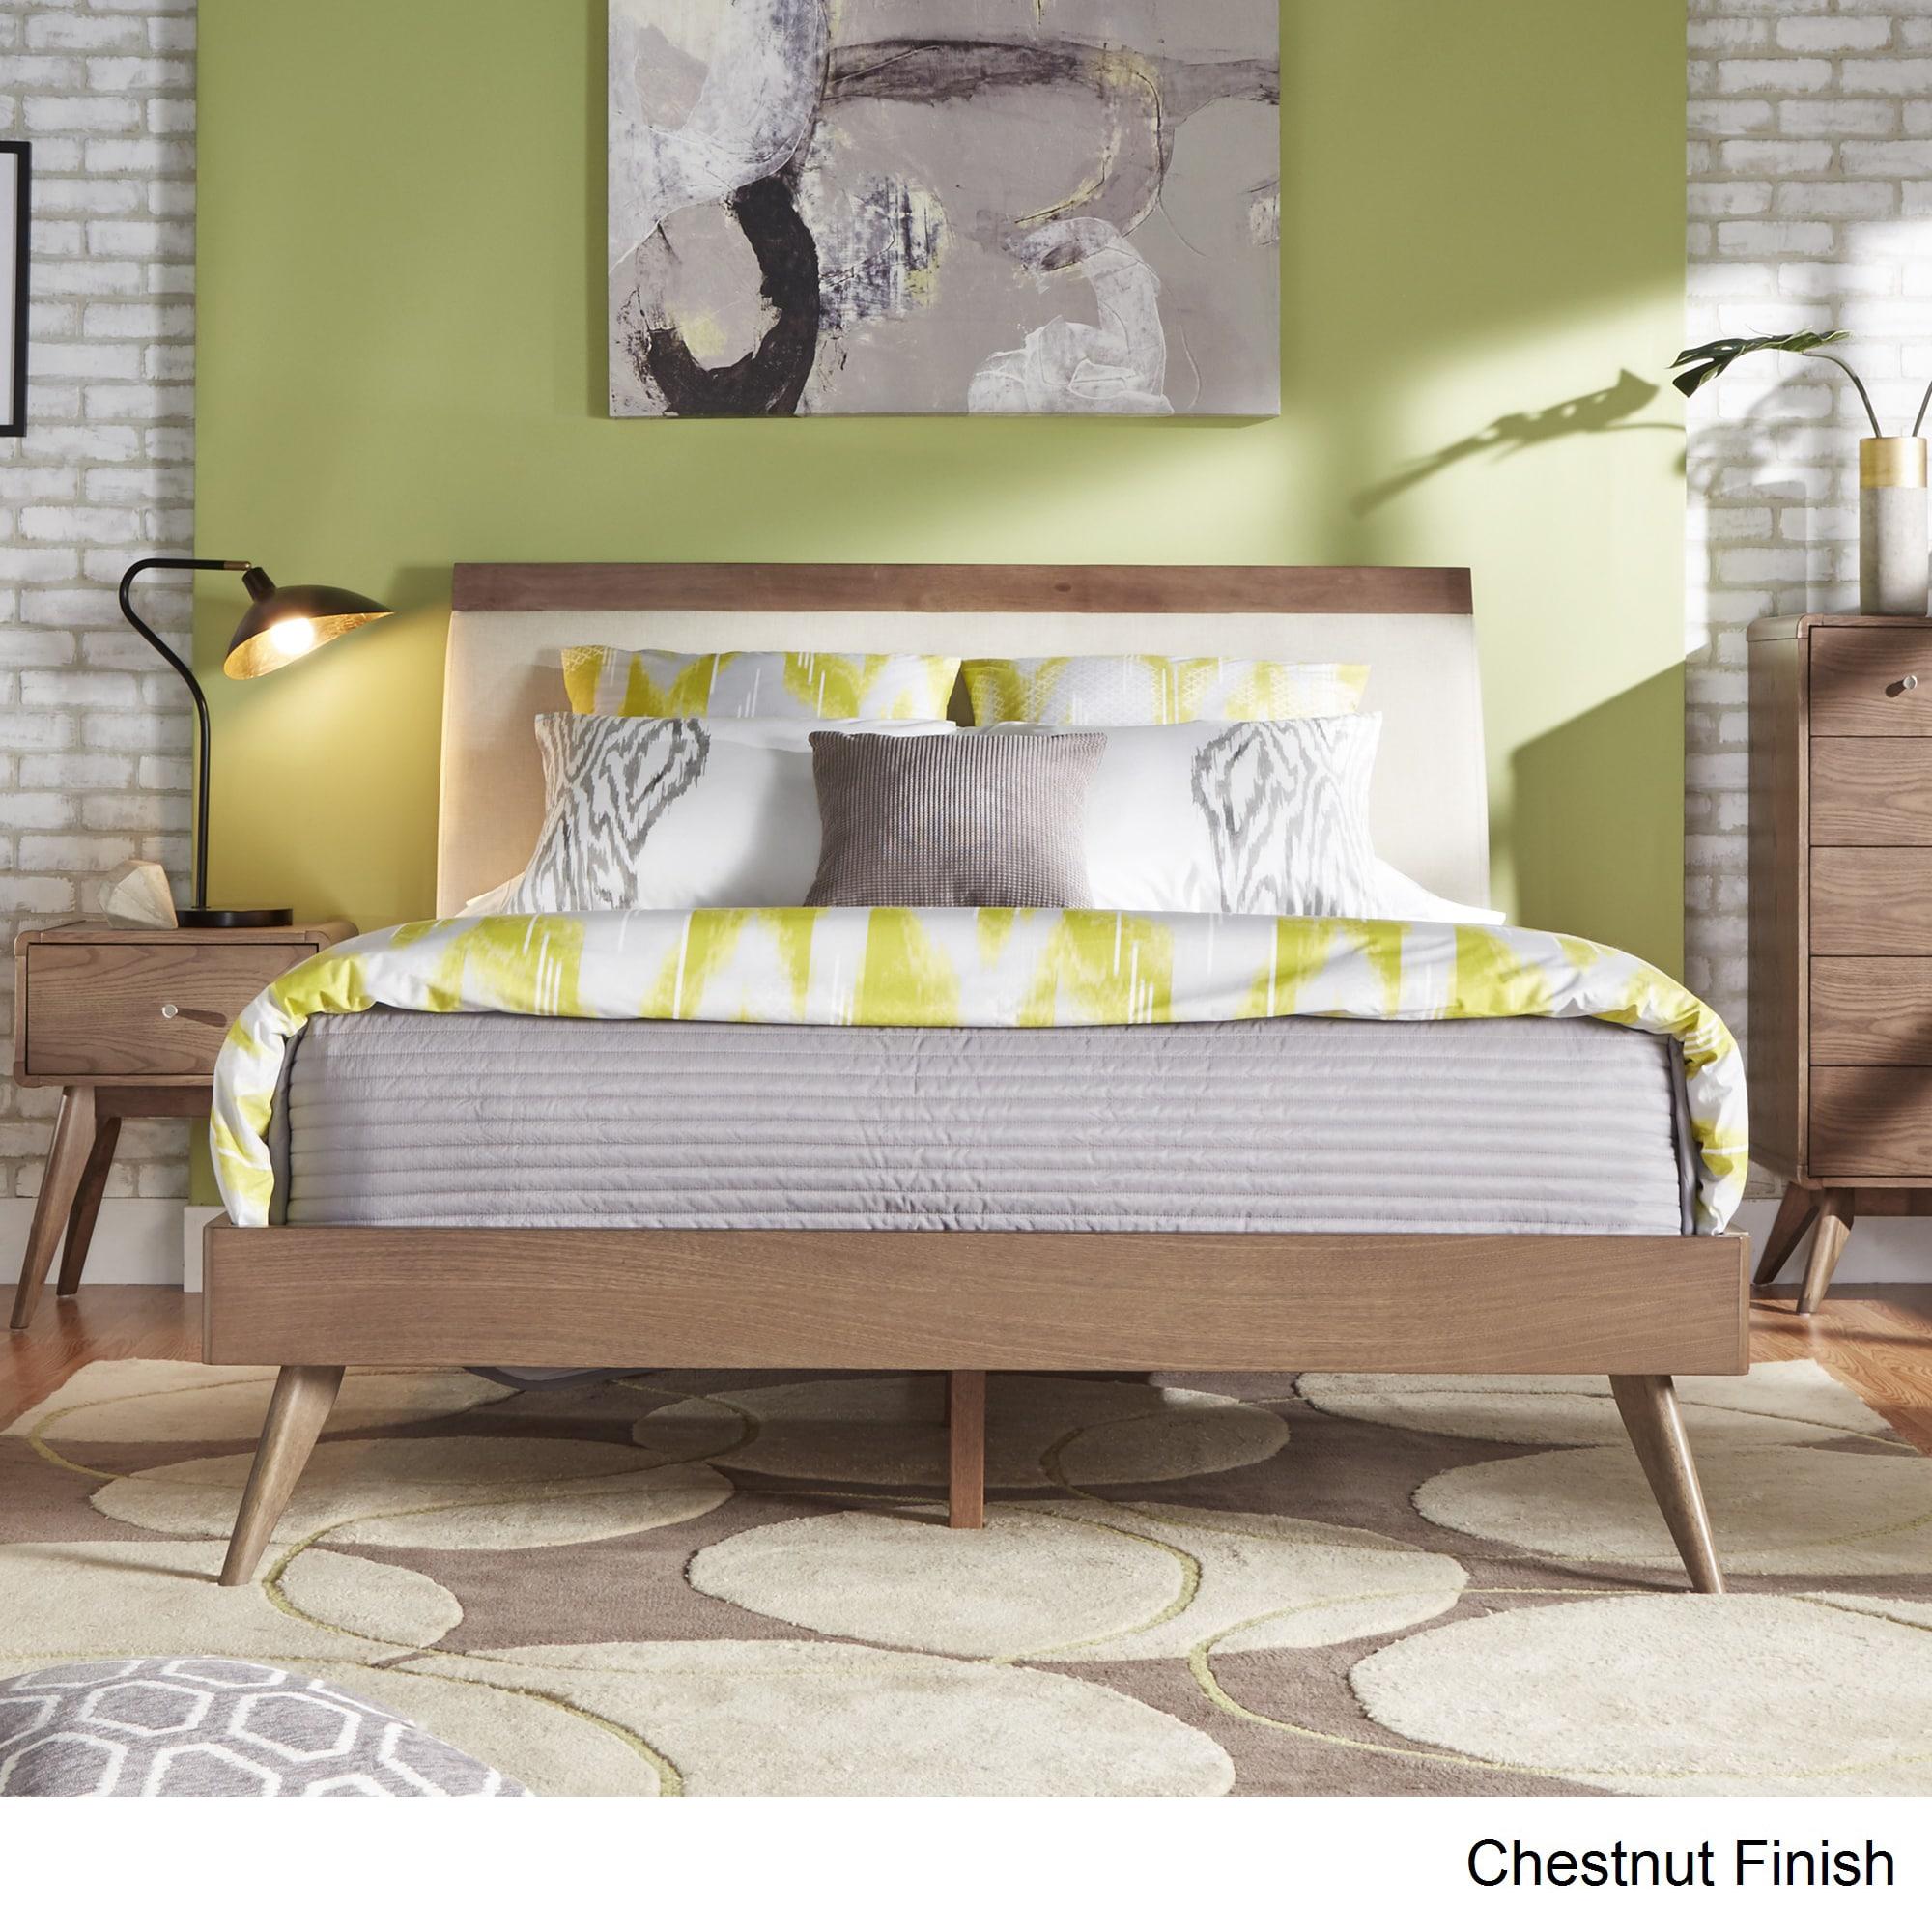 MID CENTURY LIVING Penelope Danish Modern Tapered Platform Bed